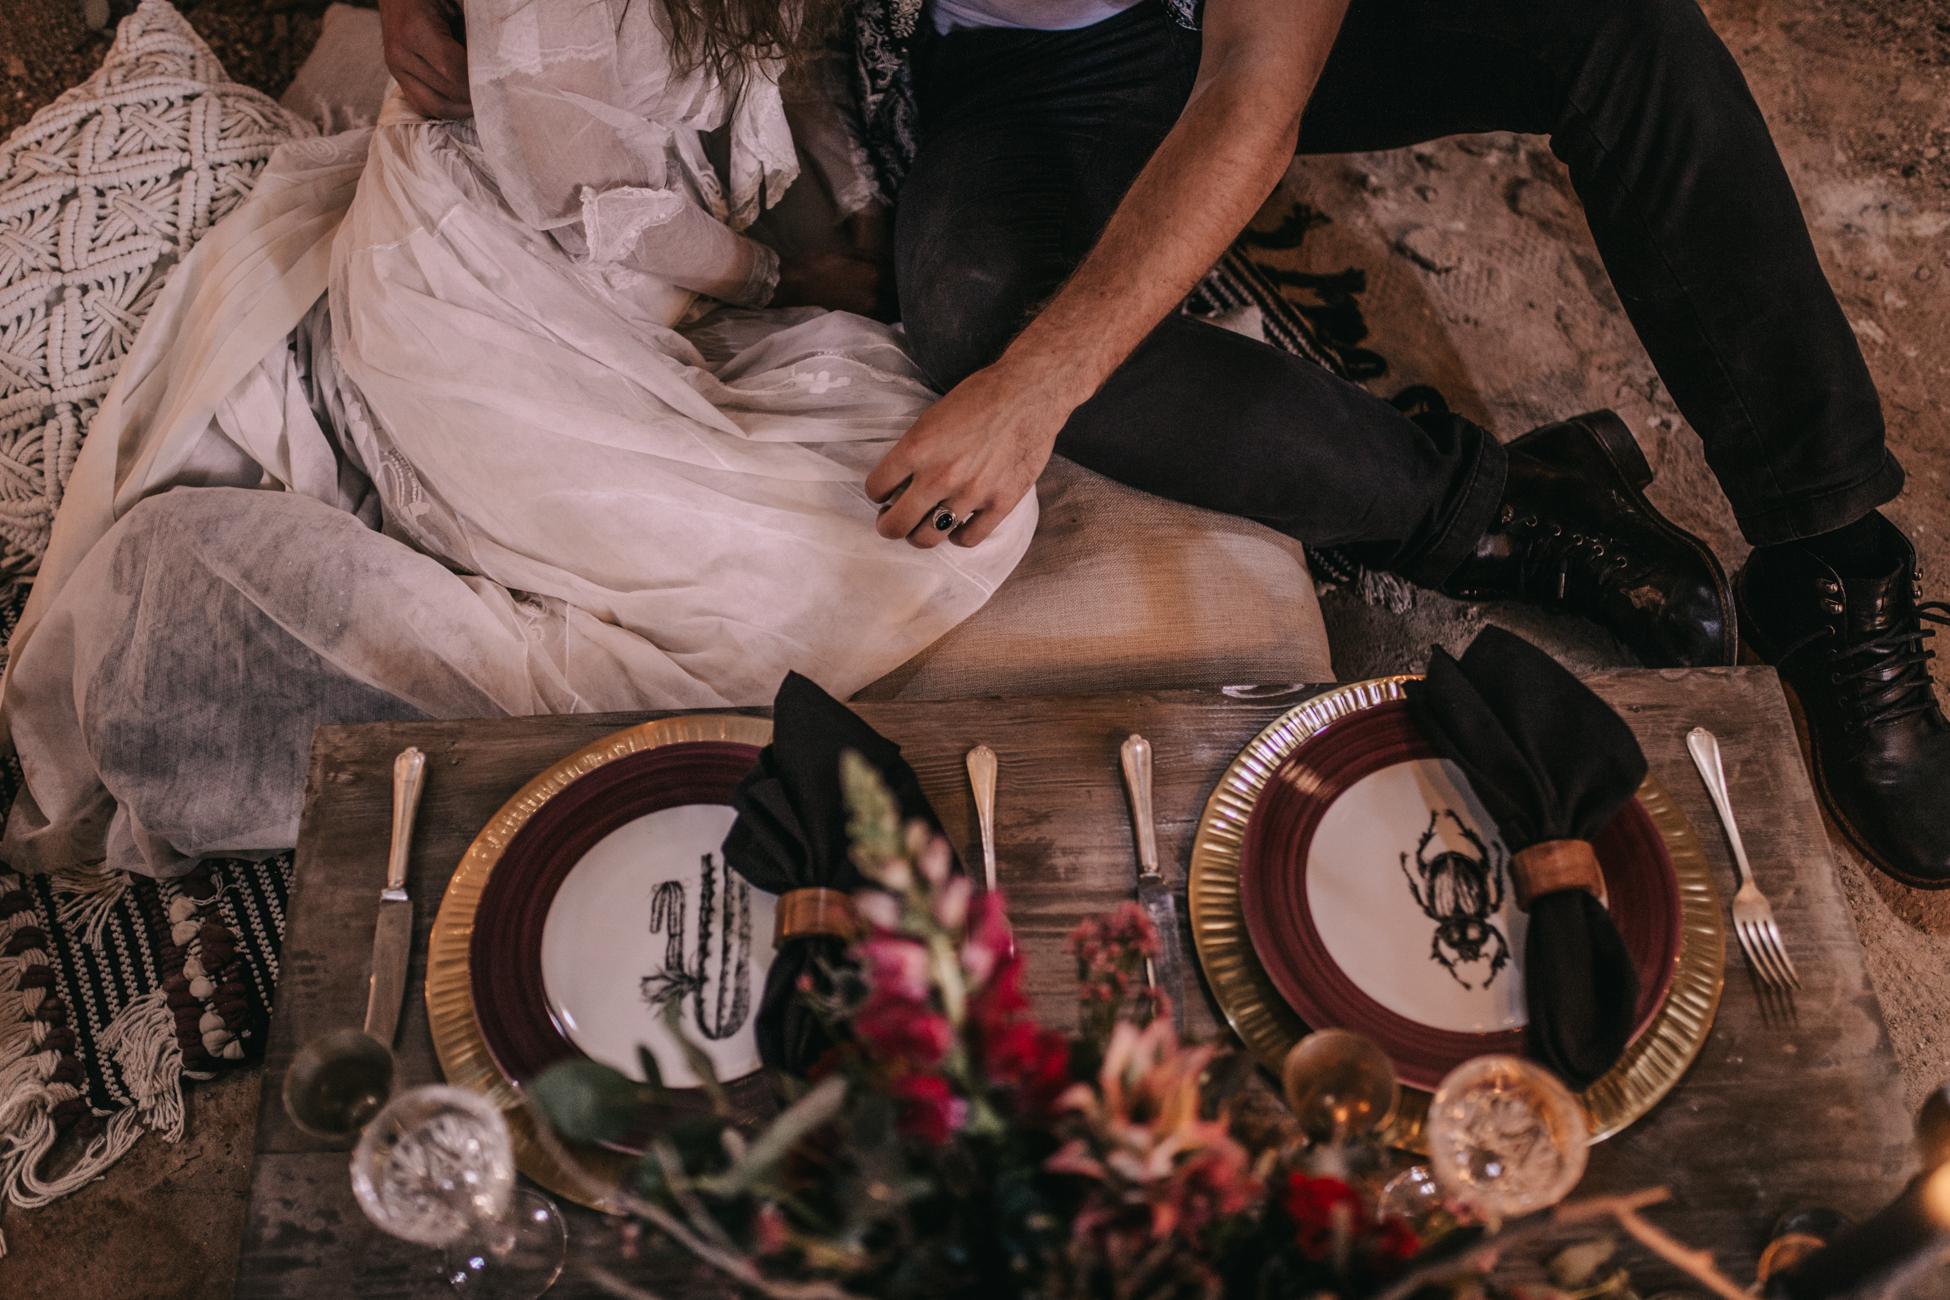 thenortherngirlphotography_photography_thenortherngirl_rebeccascabros_wedding_weddingphotography_weddingphotographer_wood_muebles_deco_bodasdecaramelo_home_bedtime_gaywedding_editorial_desierto_desert_wildestdreams_amortexano-124.jpg